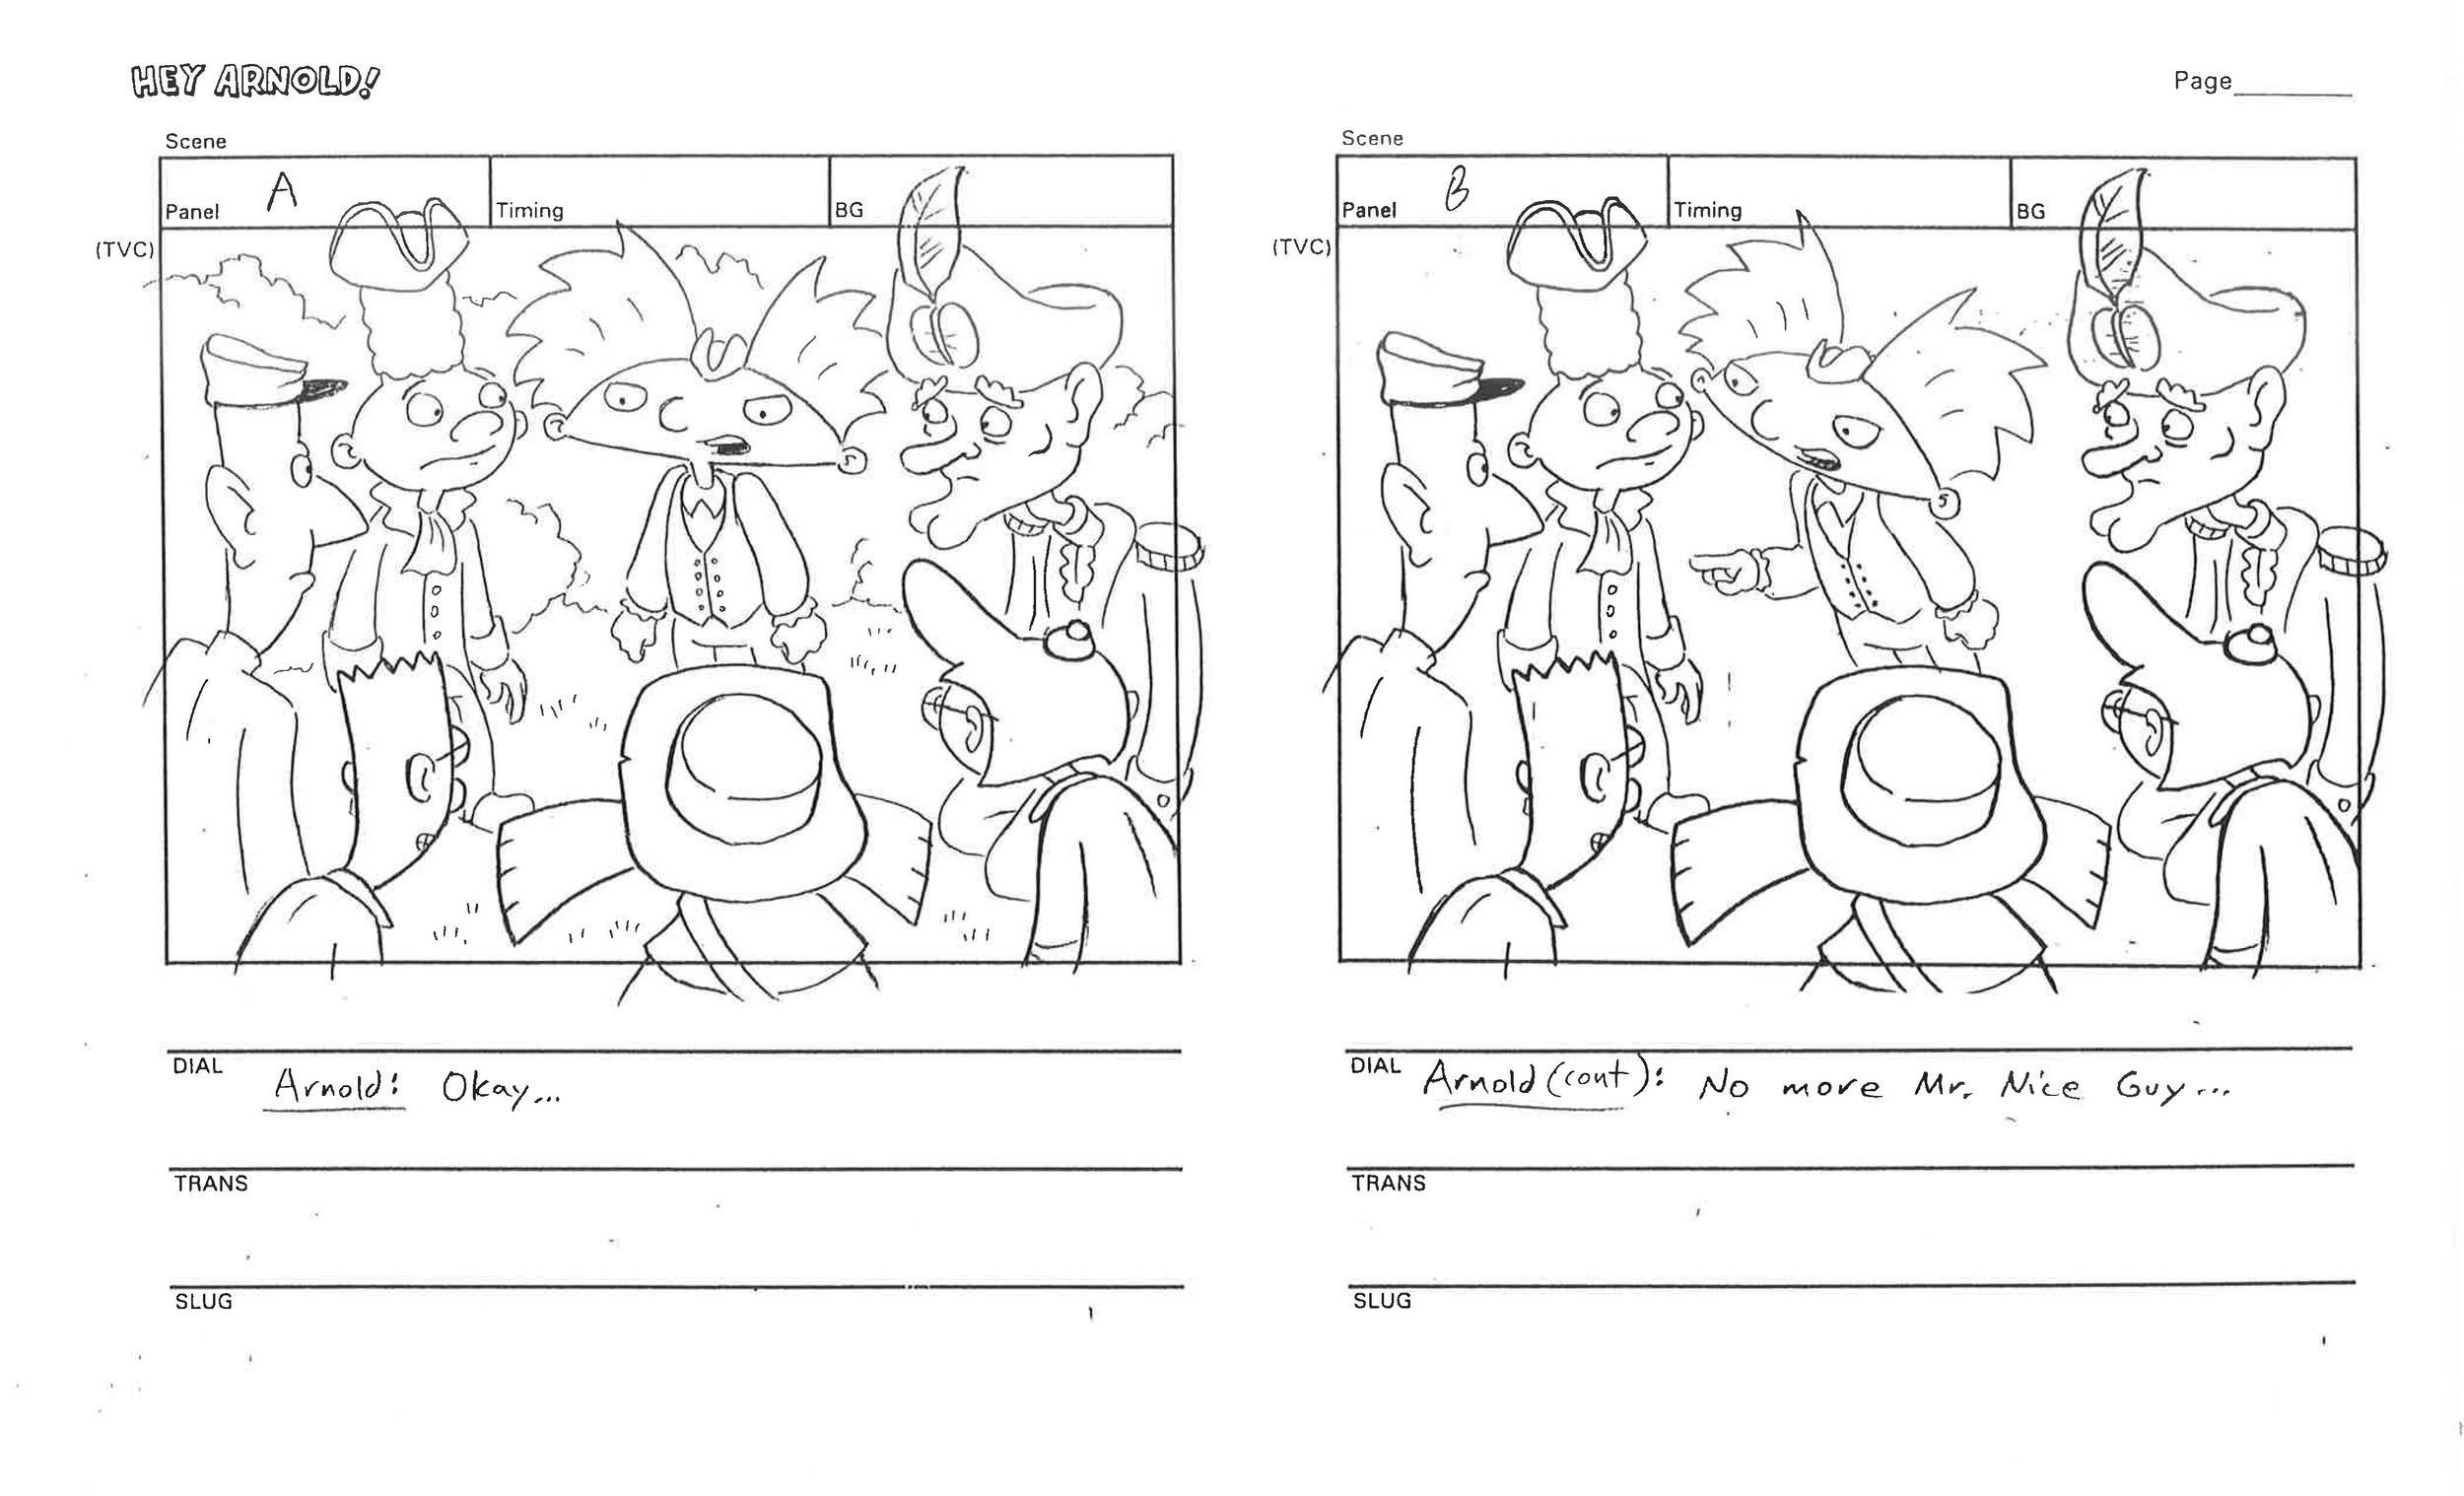 PigWar-page69.jpg